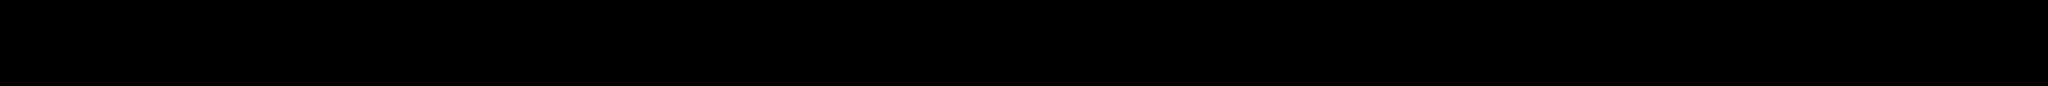 VDO 00001920QH, 1920QH, 9688153080, 9681945580, 9684704880 Hochdruckpumpe